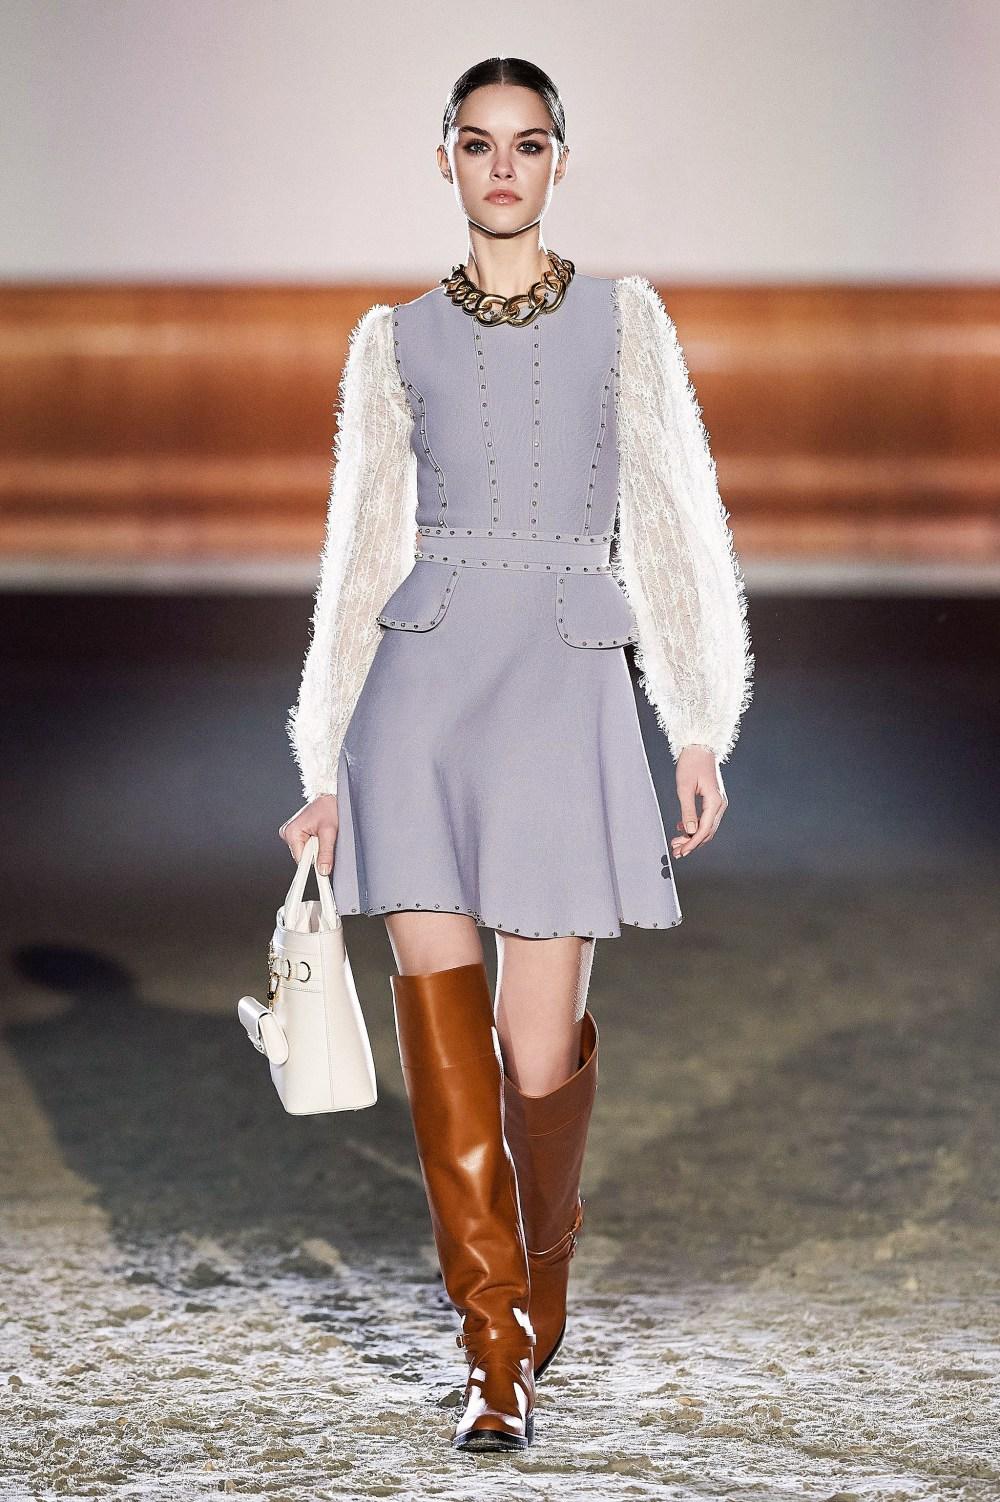 Elisabetta Franchi: Elisabetta Franchi Fall Winter 2021-22 Fashion Show Photo #19